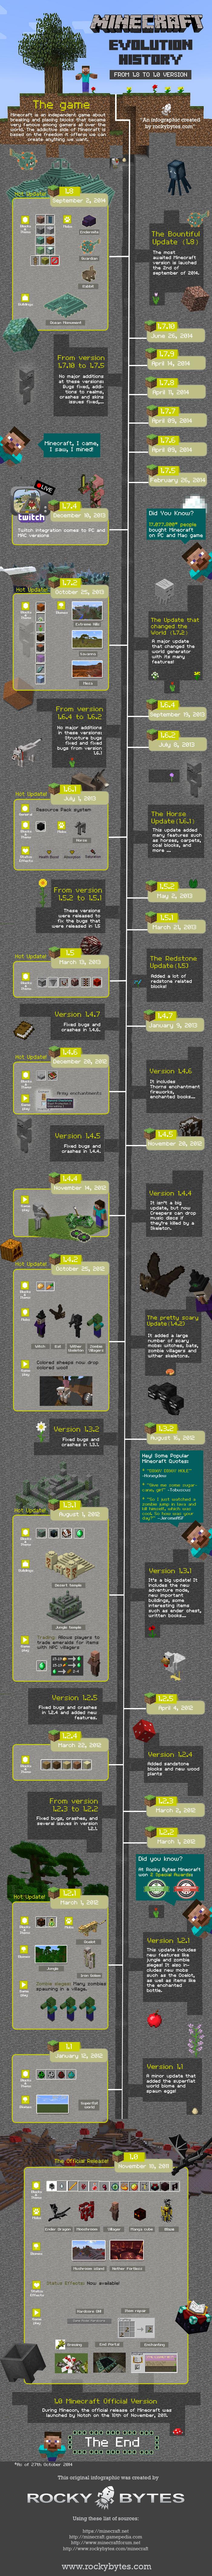 Minecraft Version History infographic